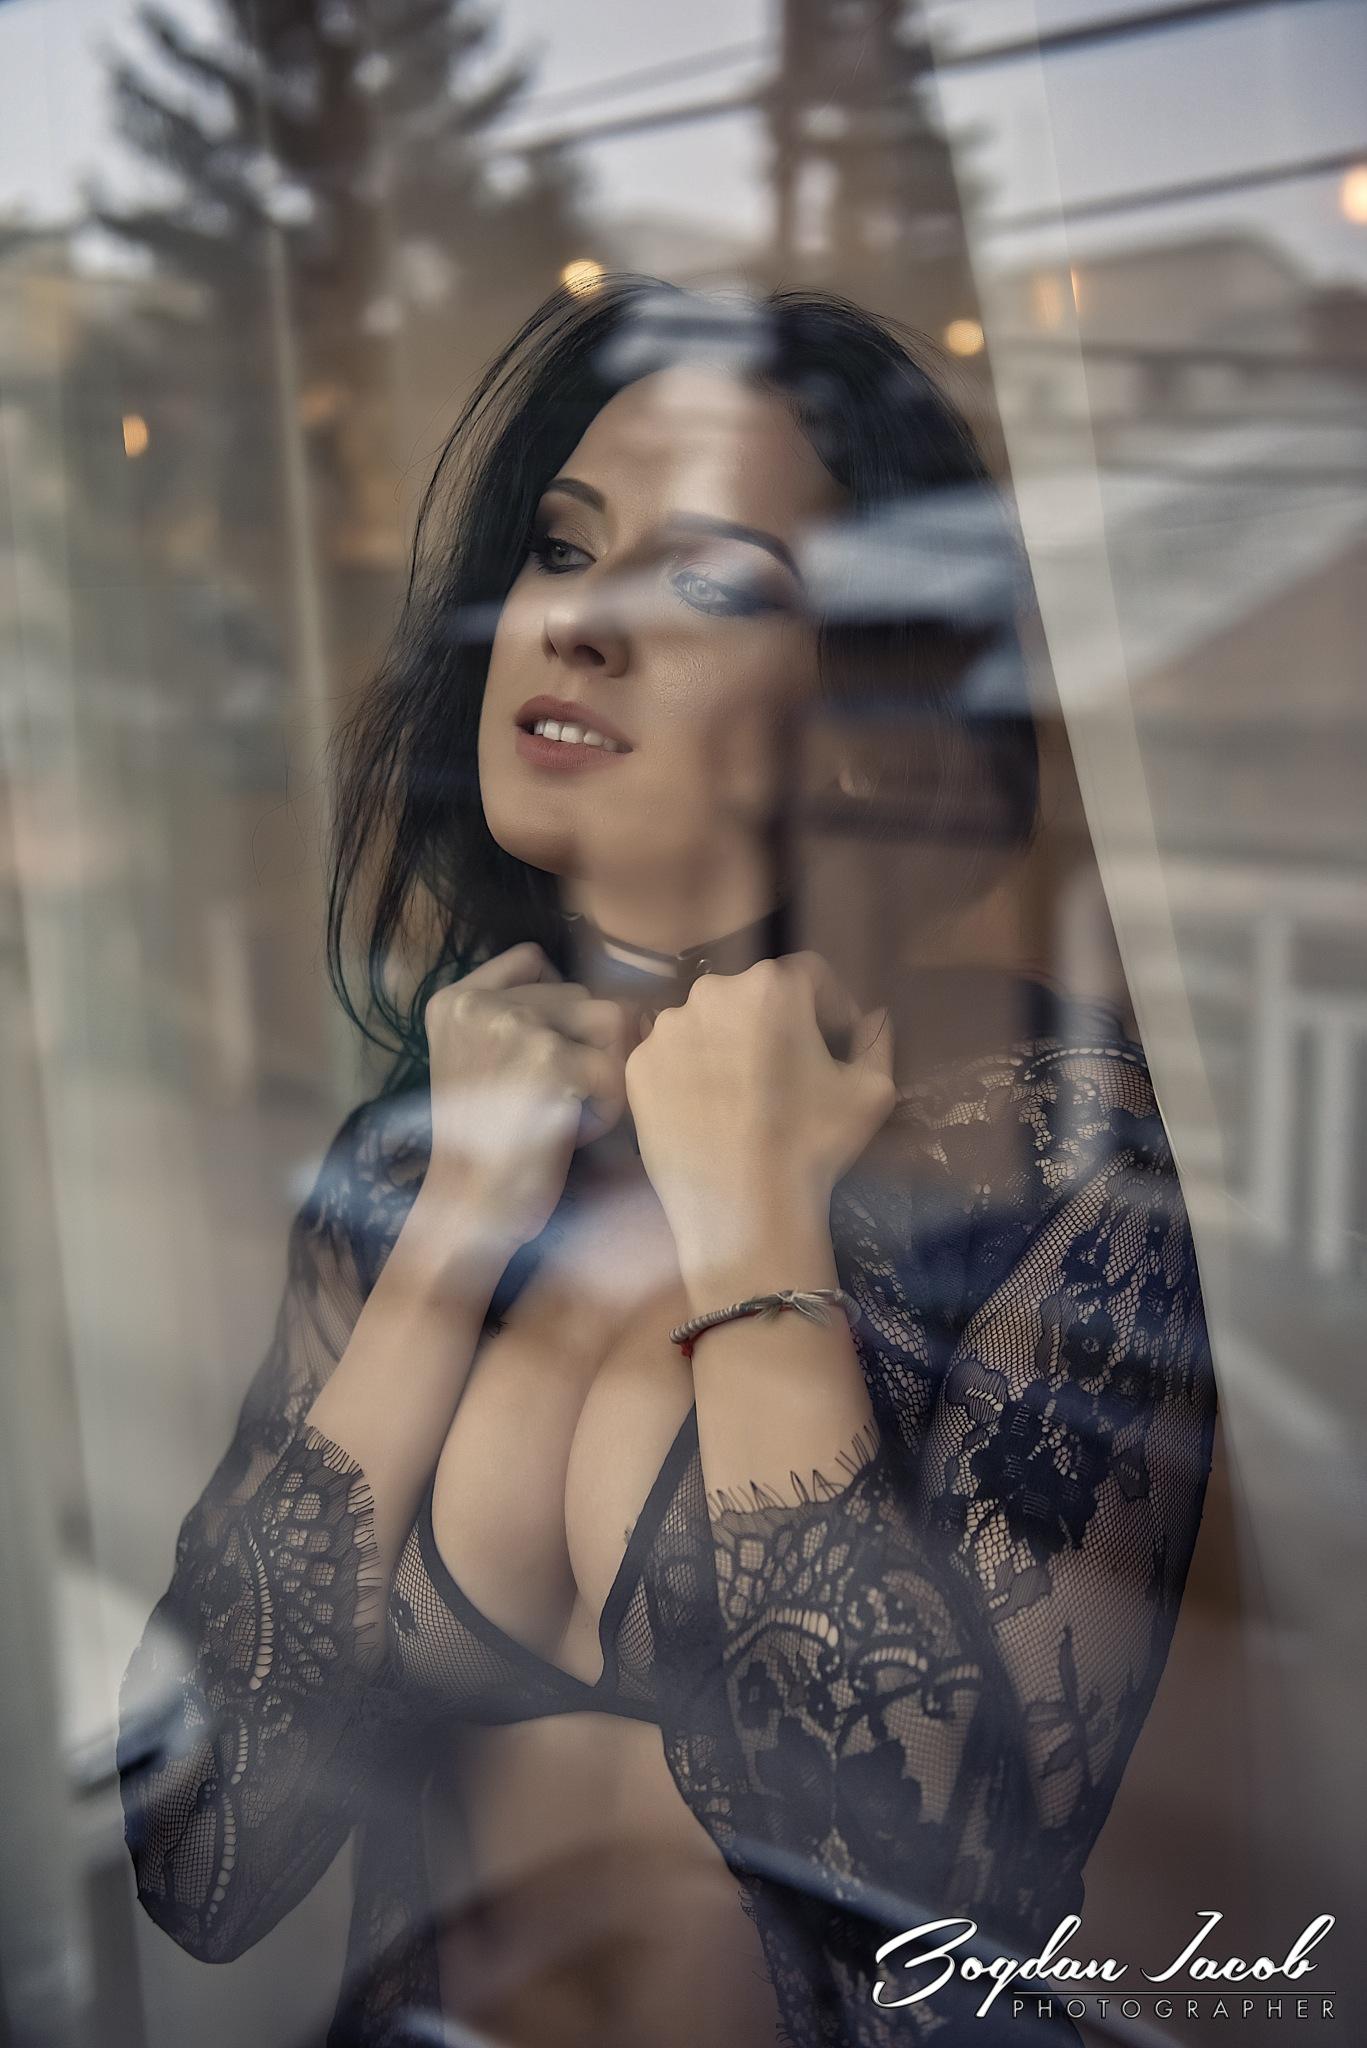 By the window by Bogdan Iacob